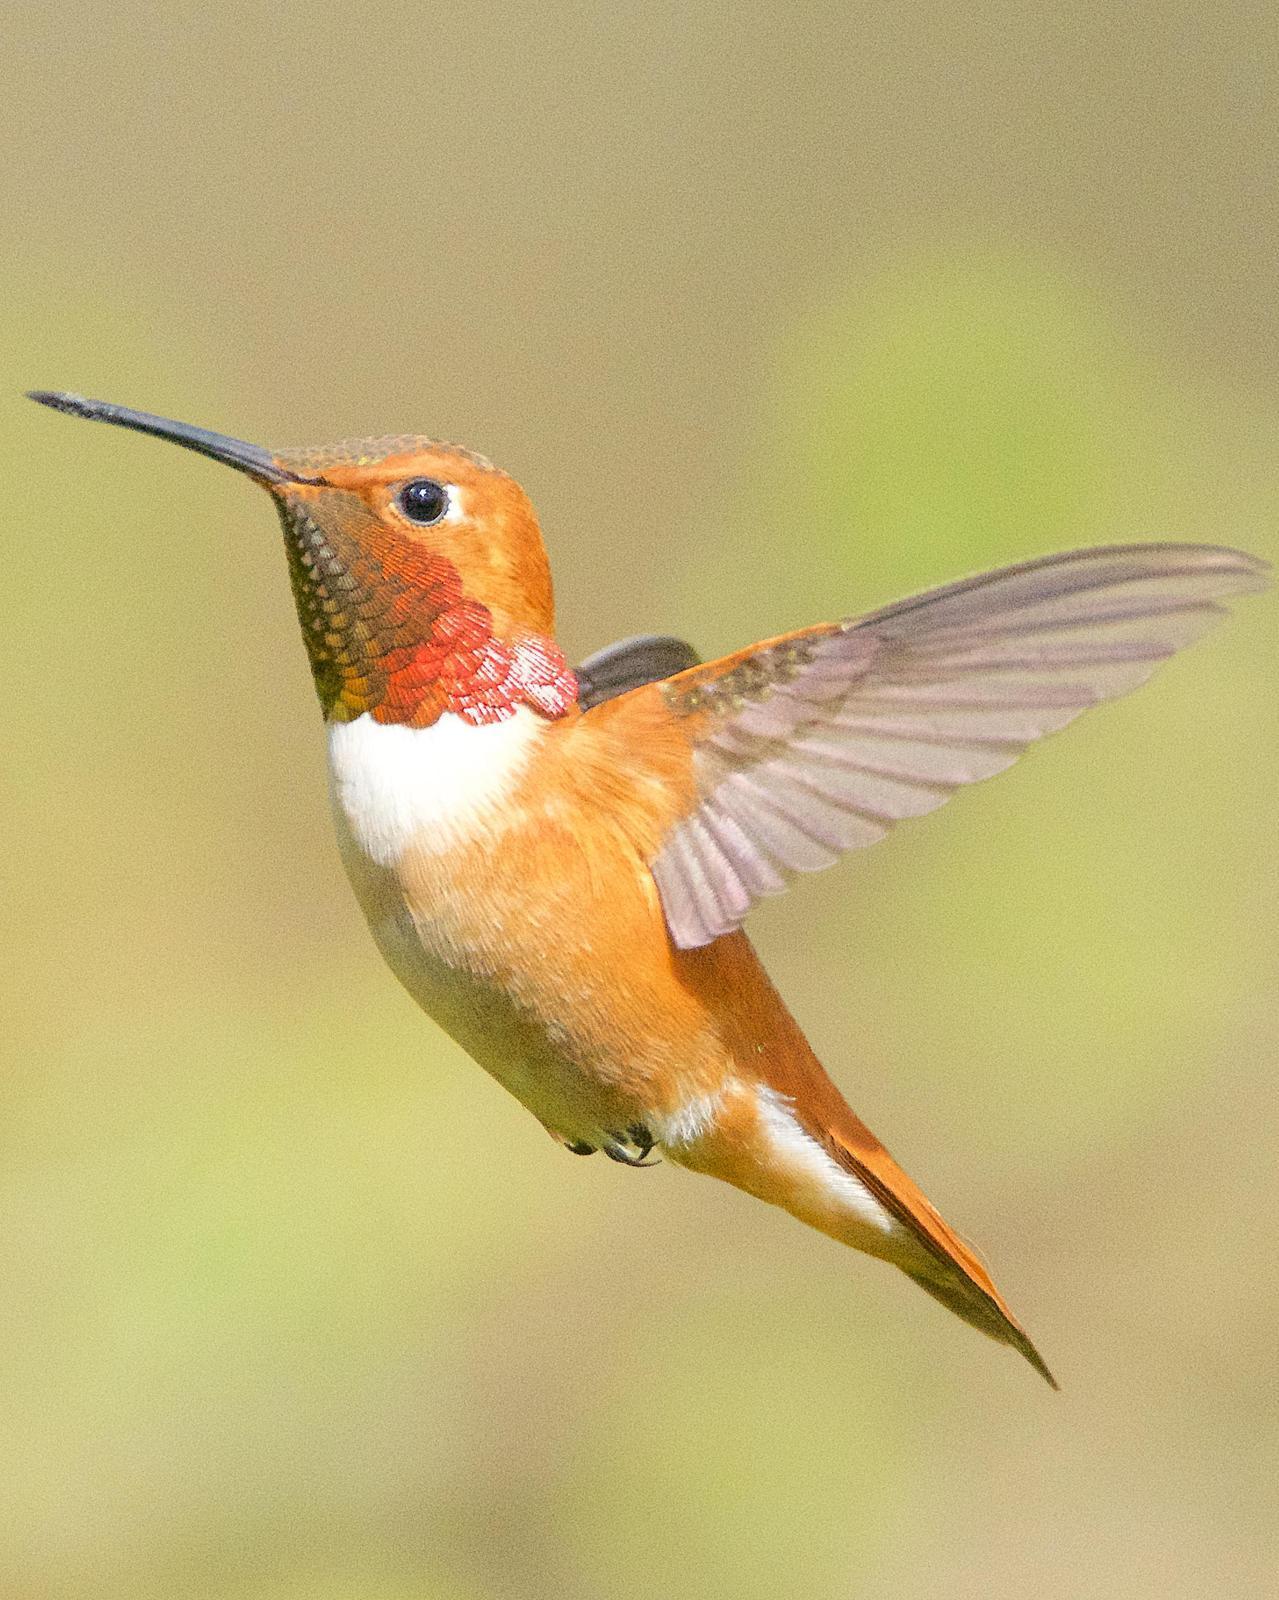 Rufous Hummingbird Photo by Brian Avent